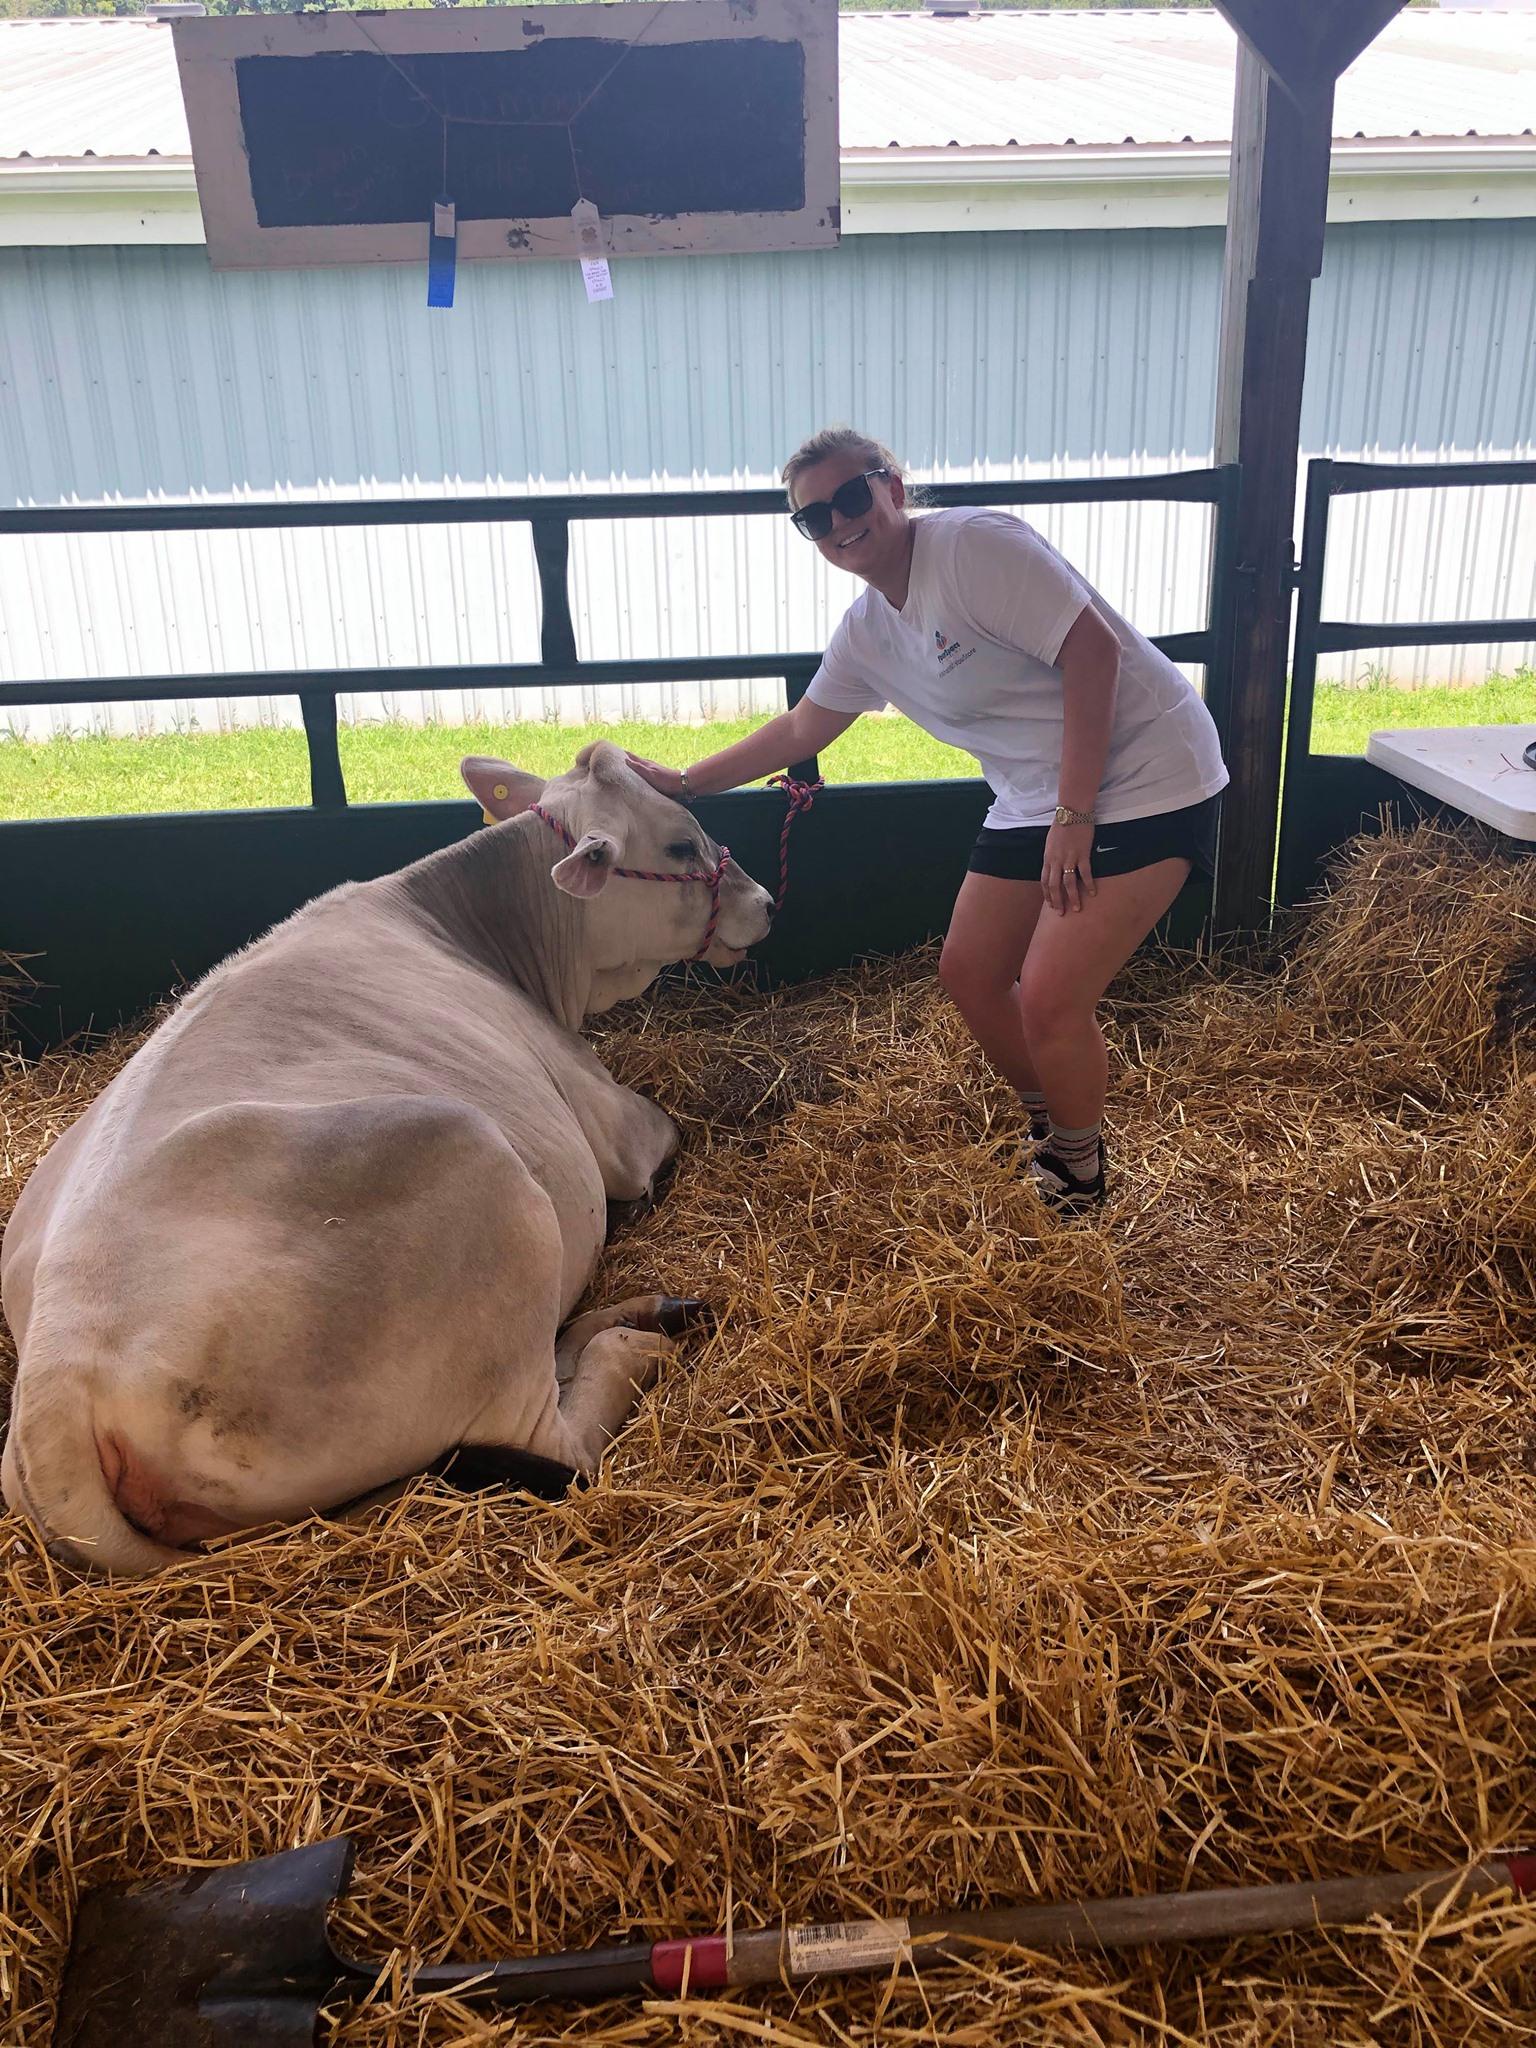 Peak Management at the Harford County Farm Fair